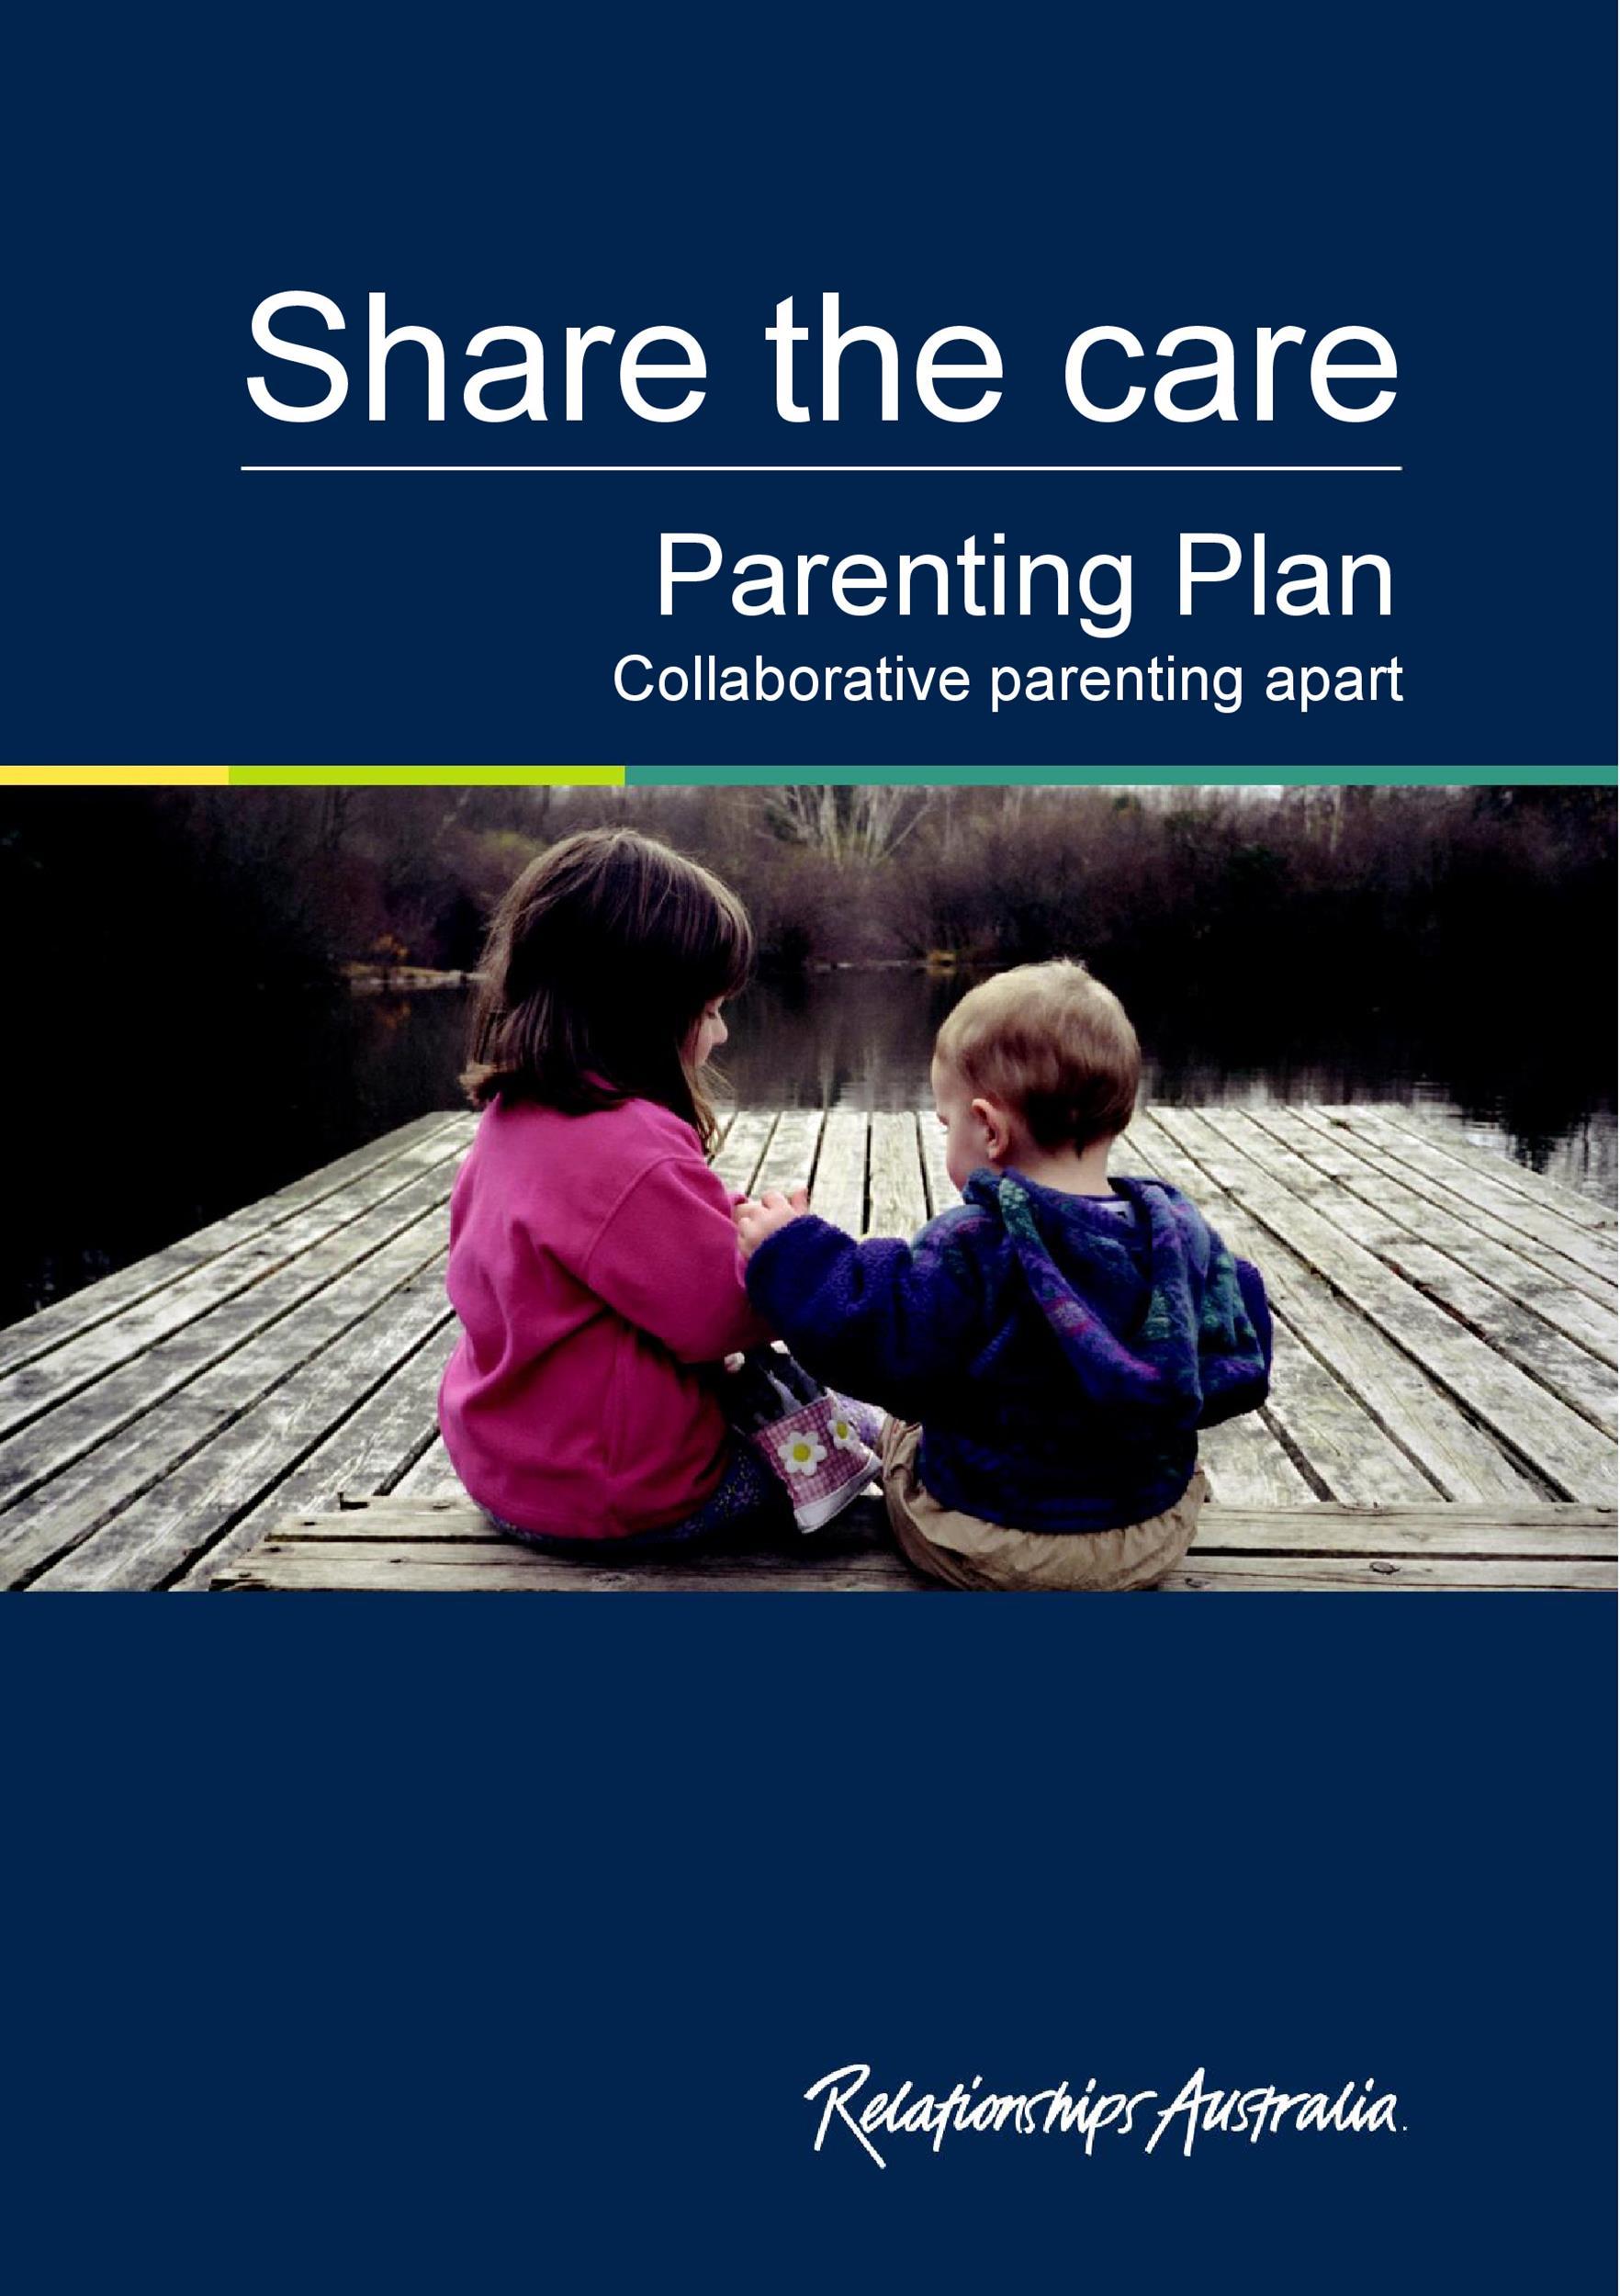 Free parenting plan template 20